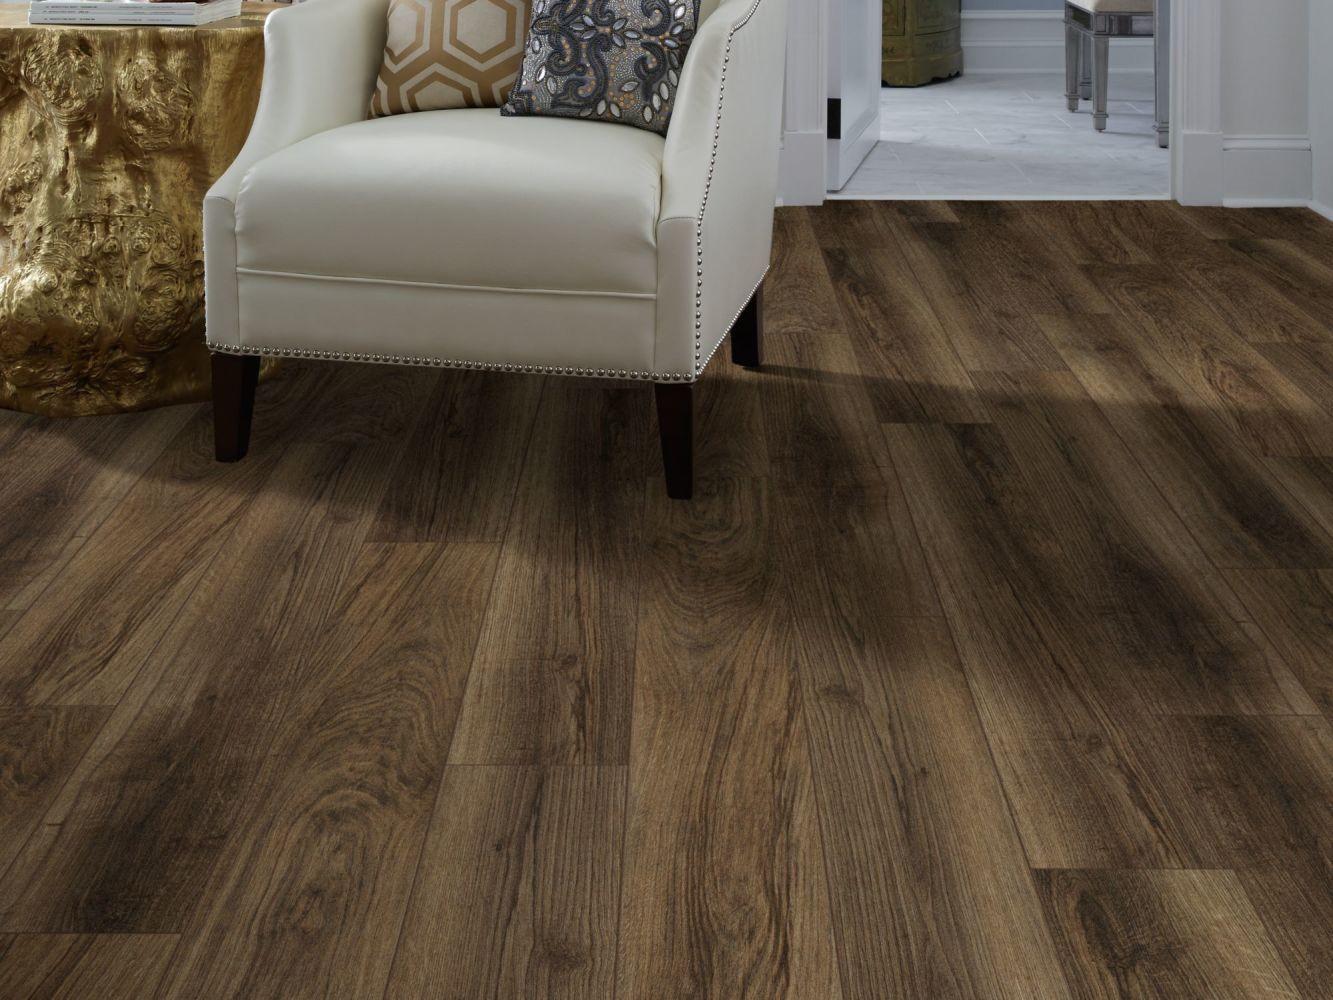 Shaw Floors Reality Homes Makah Cocco 00758_109RH